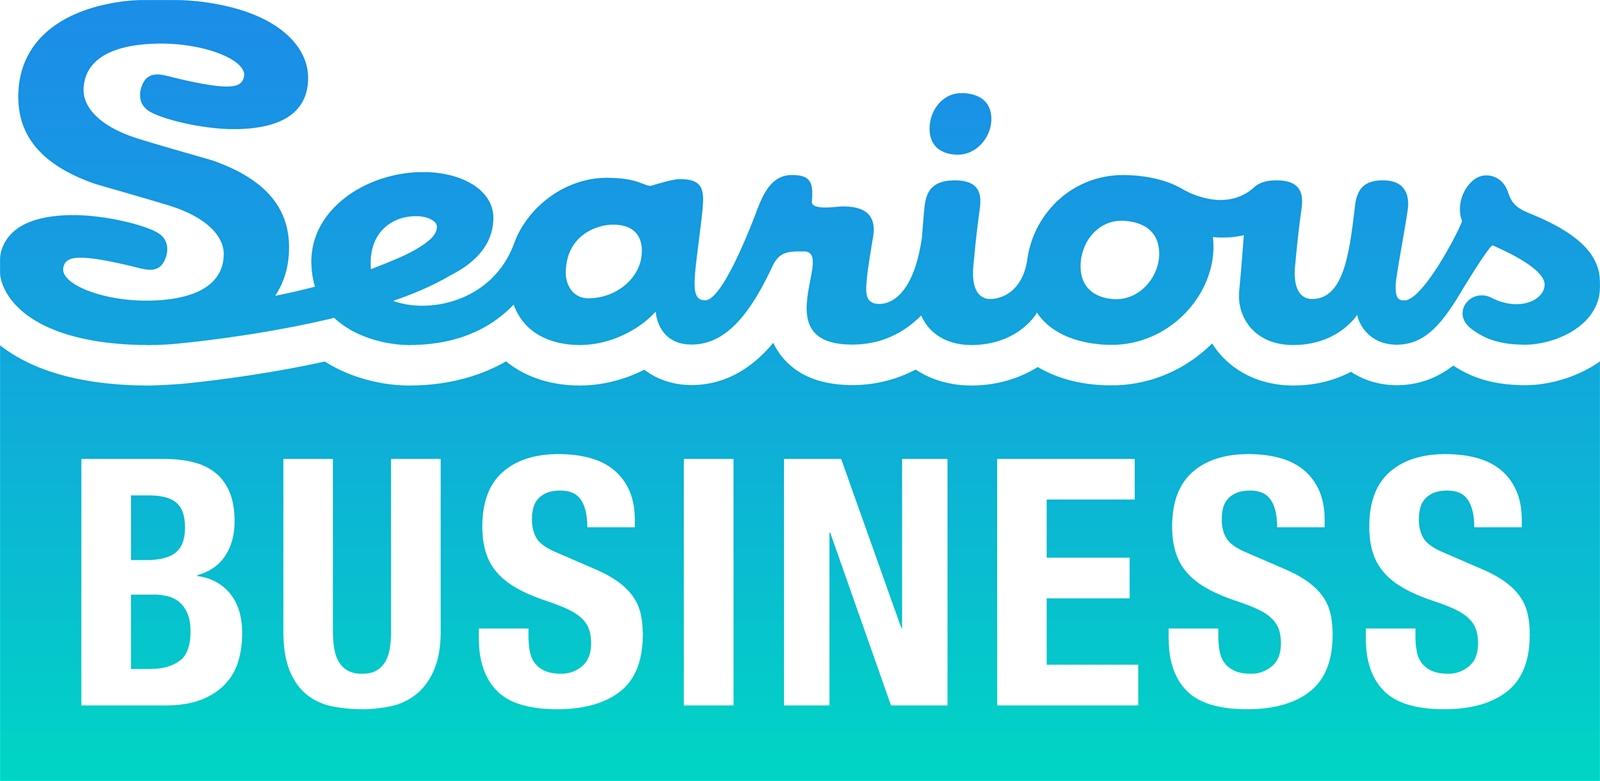 Searious Business-logo